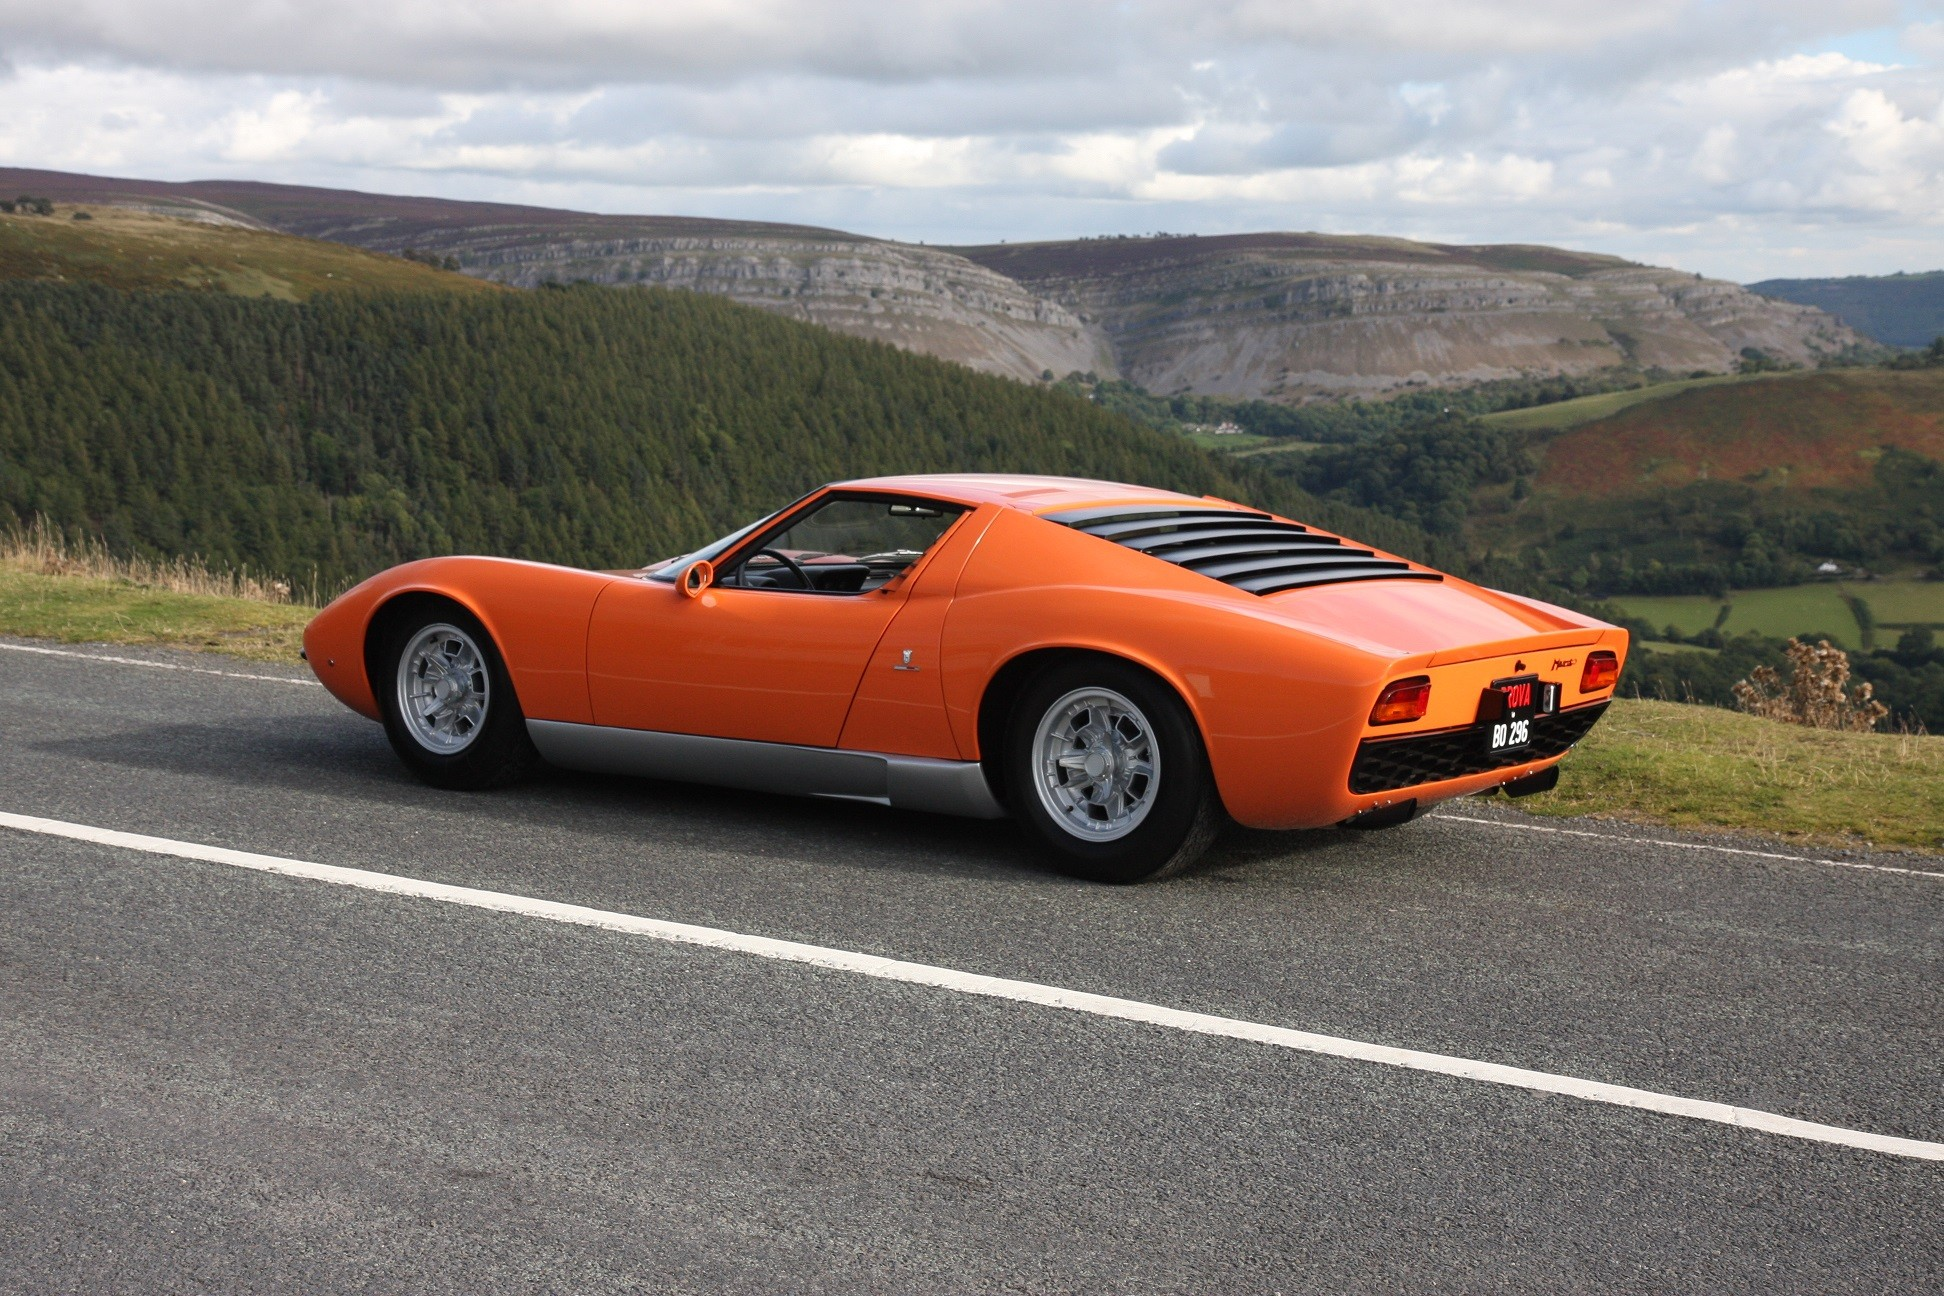 HQ Lamborghini Miura Wallpapers | File 767.3Kb